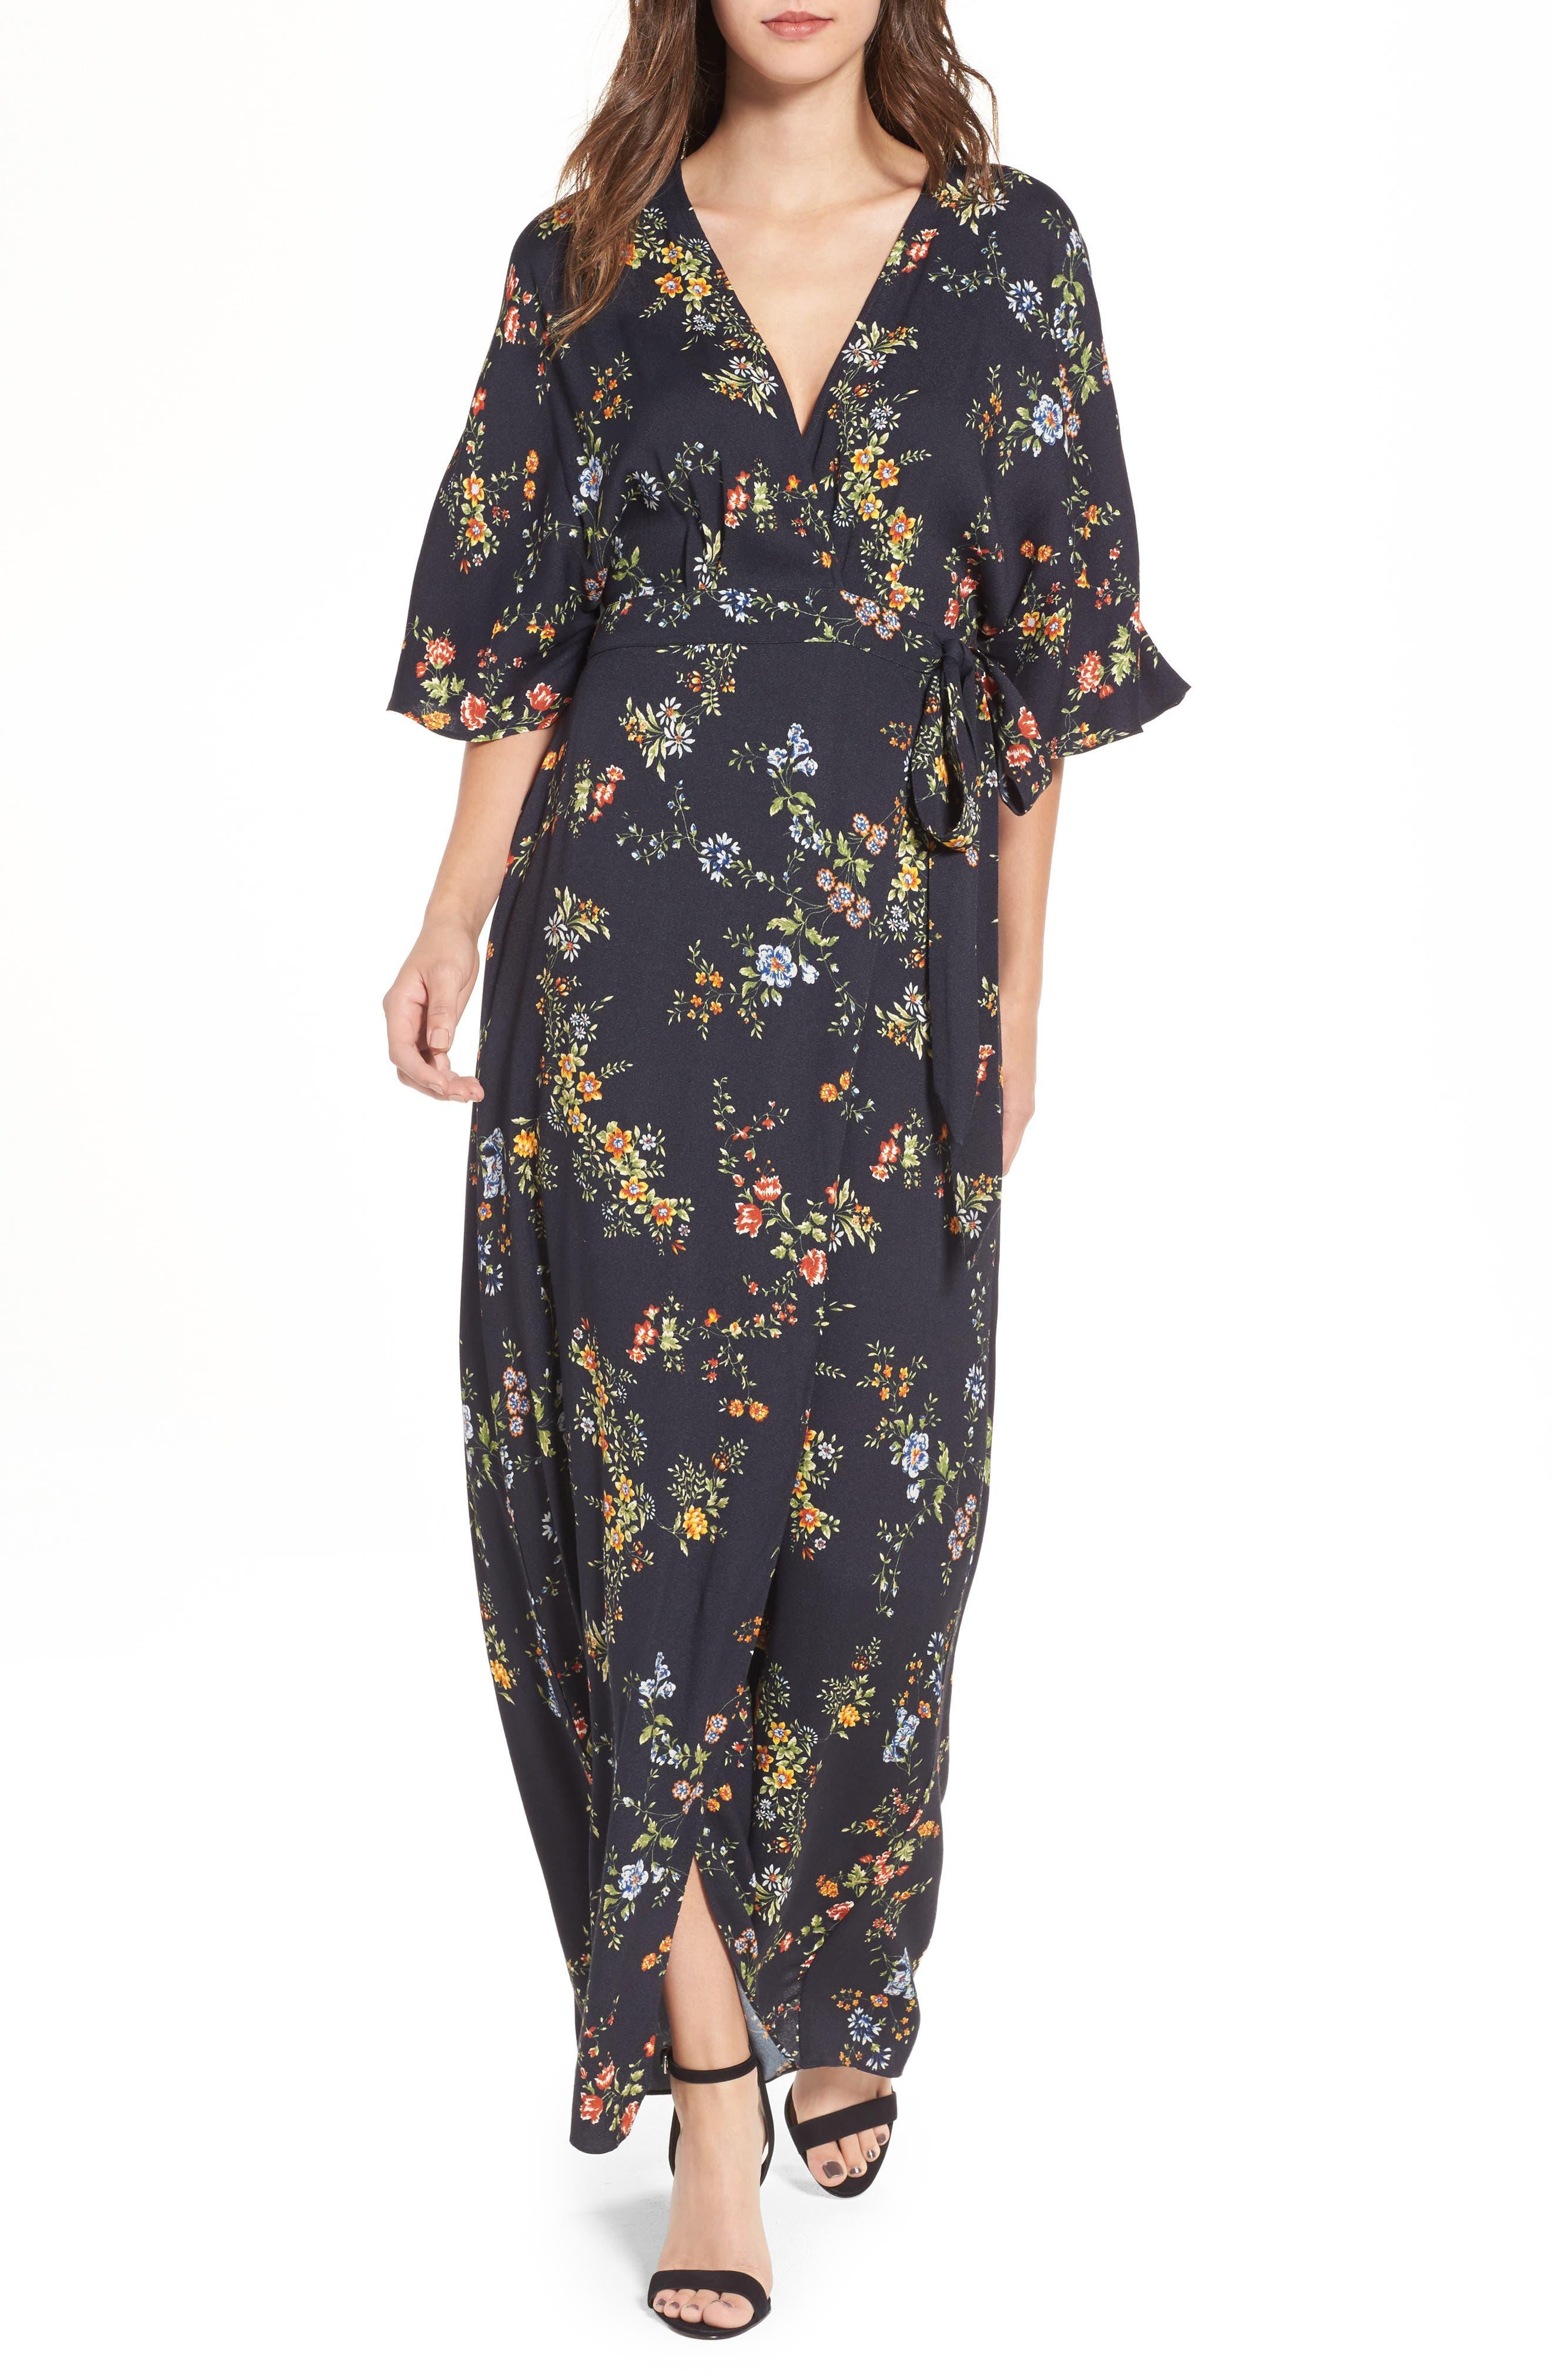 AFRM,                             Monroe Wrap Dress,                             Main thumbnail 1, color,                             001